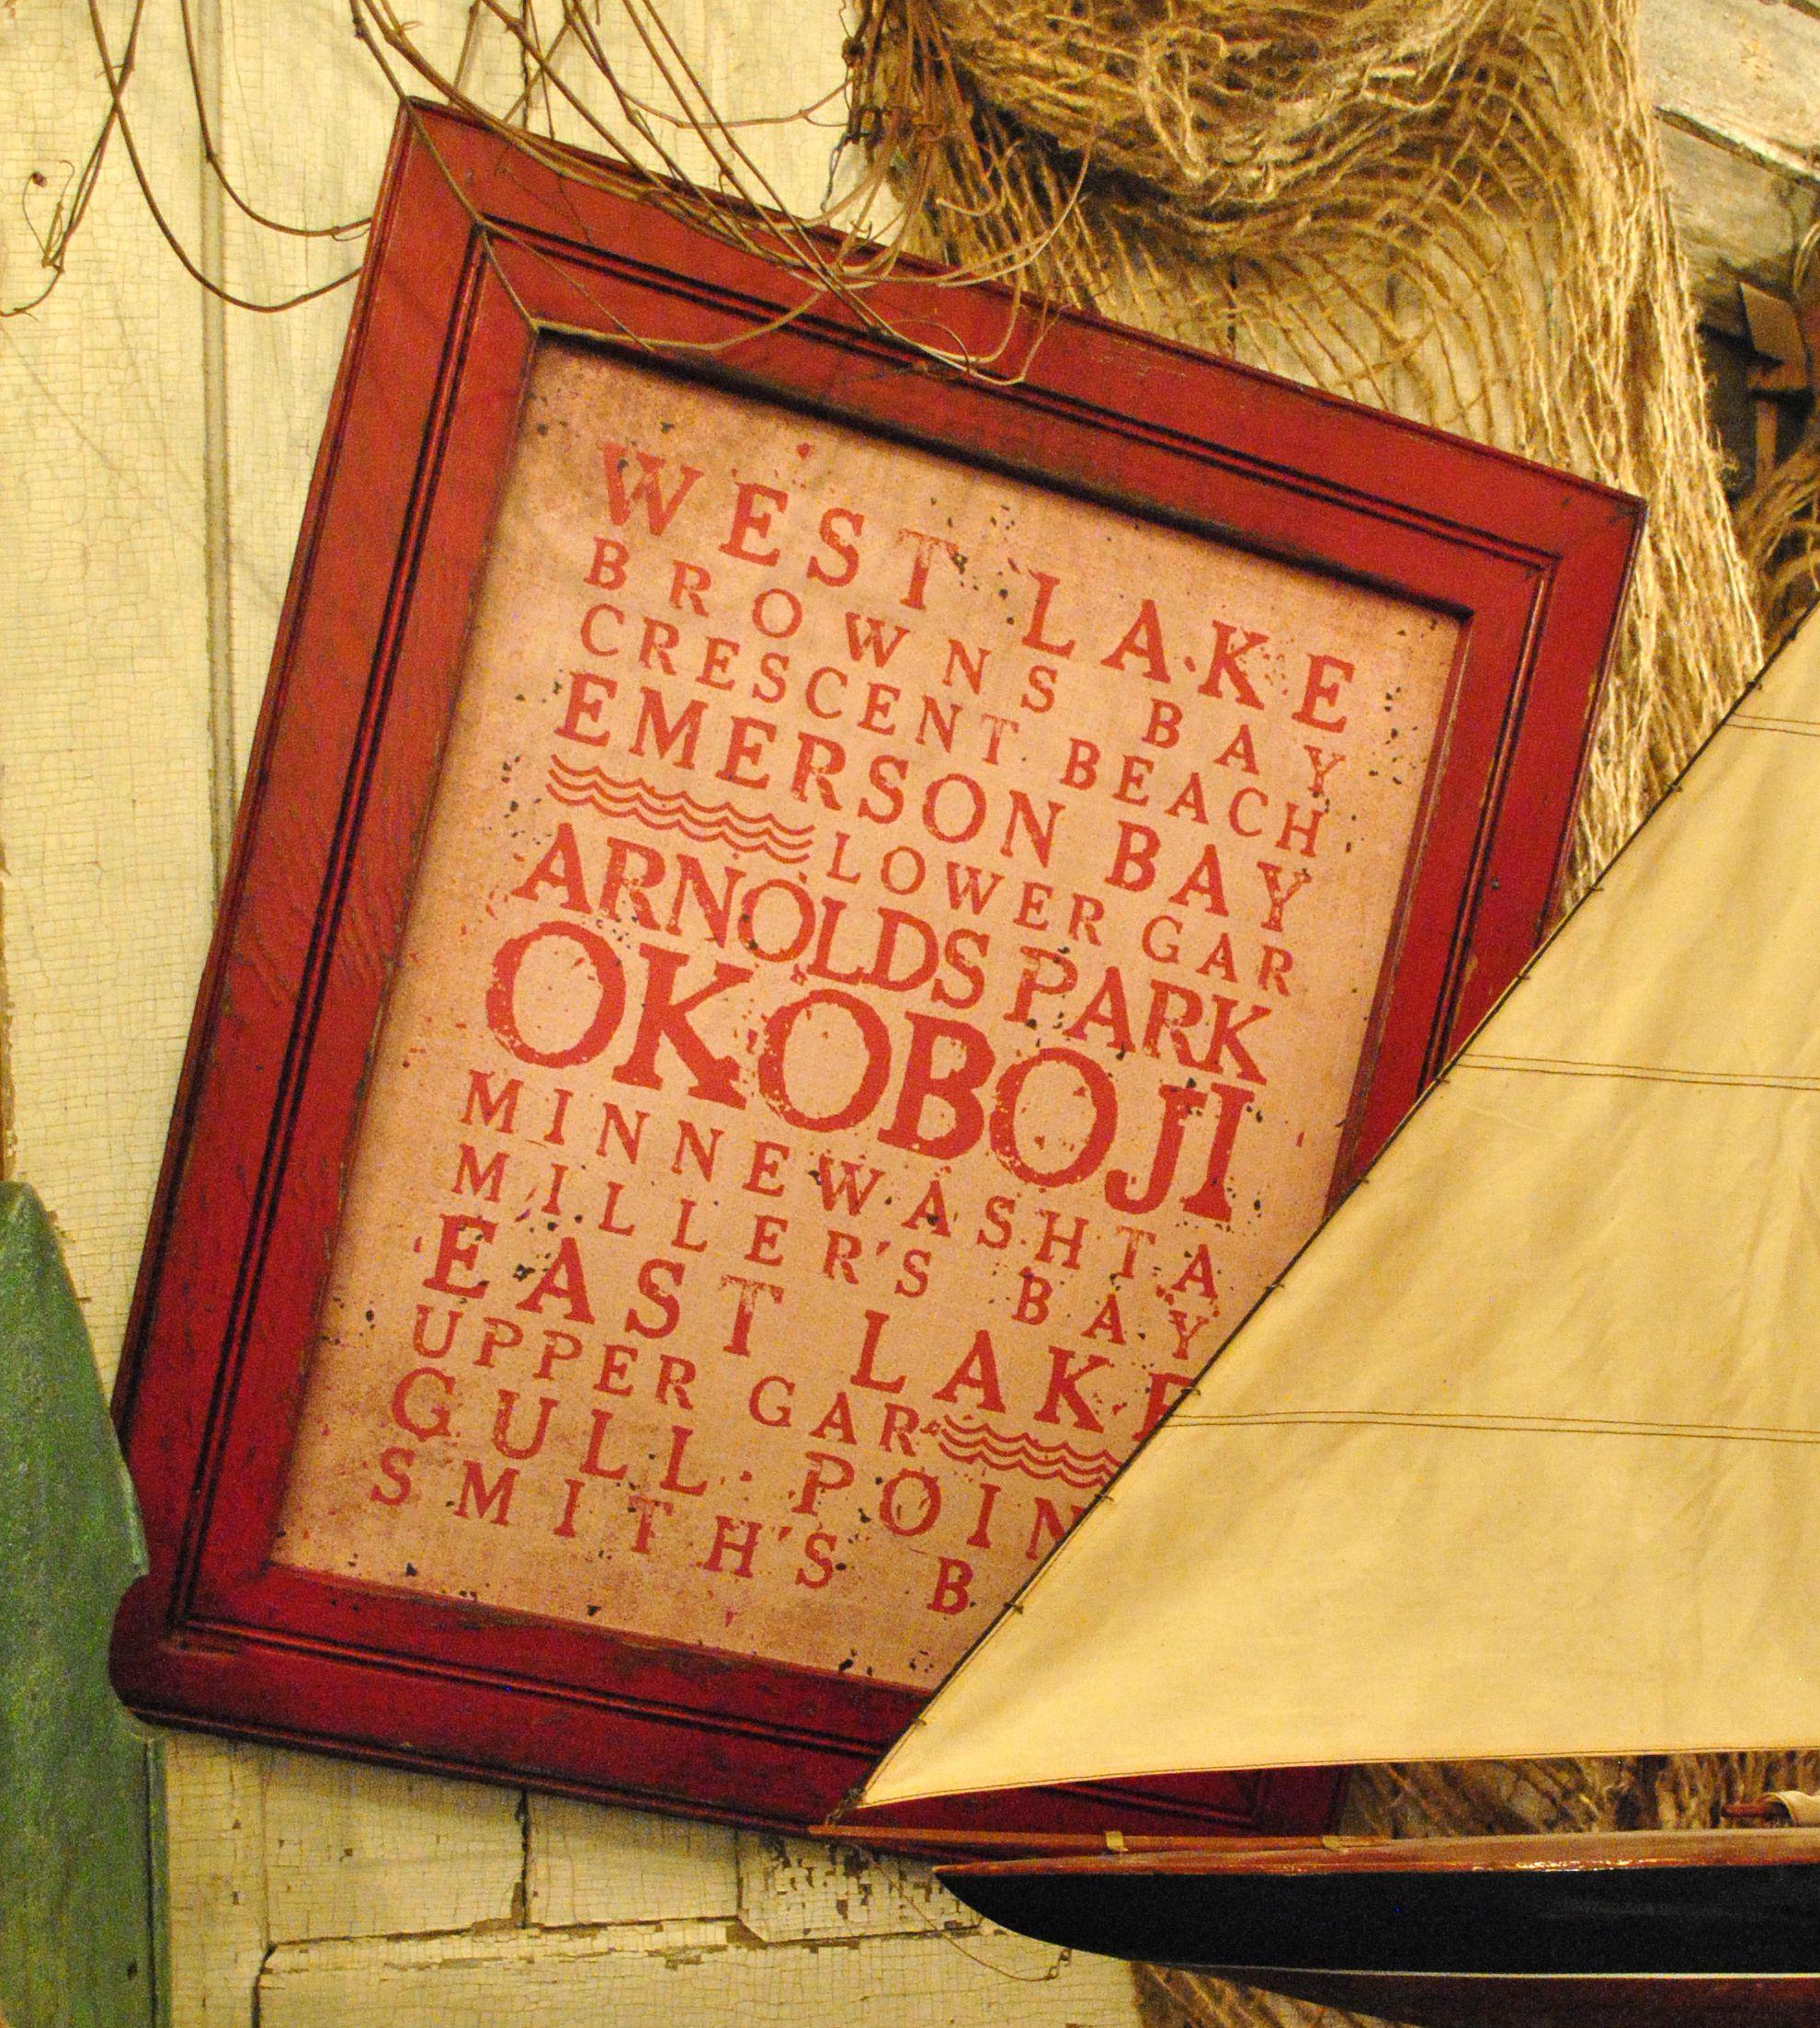 okoboji arnolds property life cabin cabins the rentals park